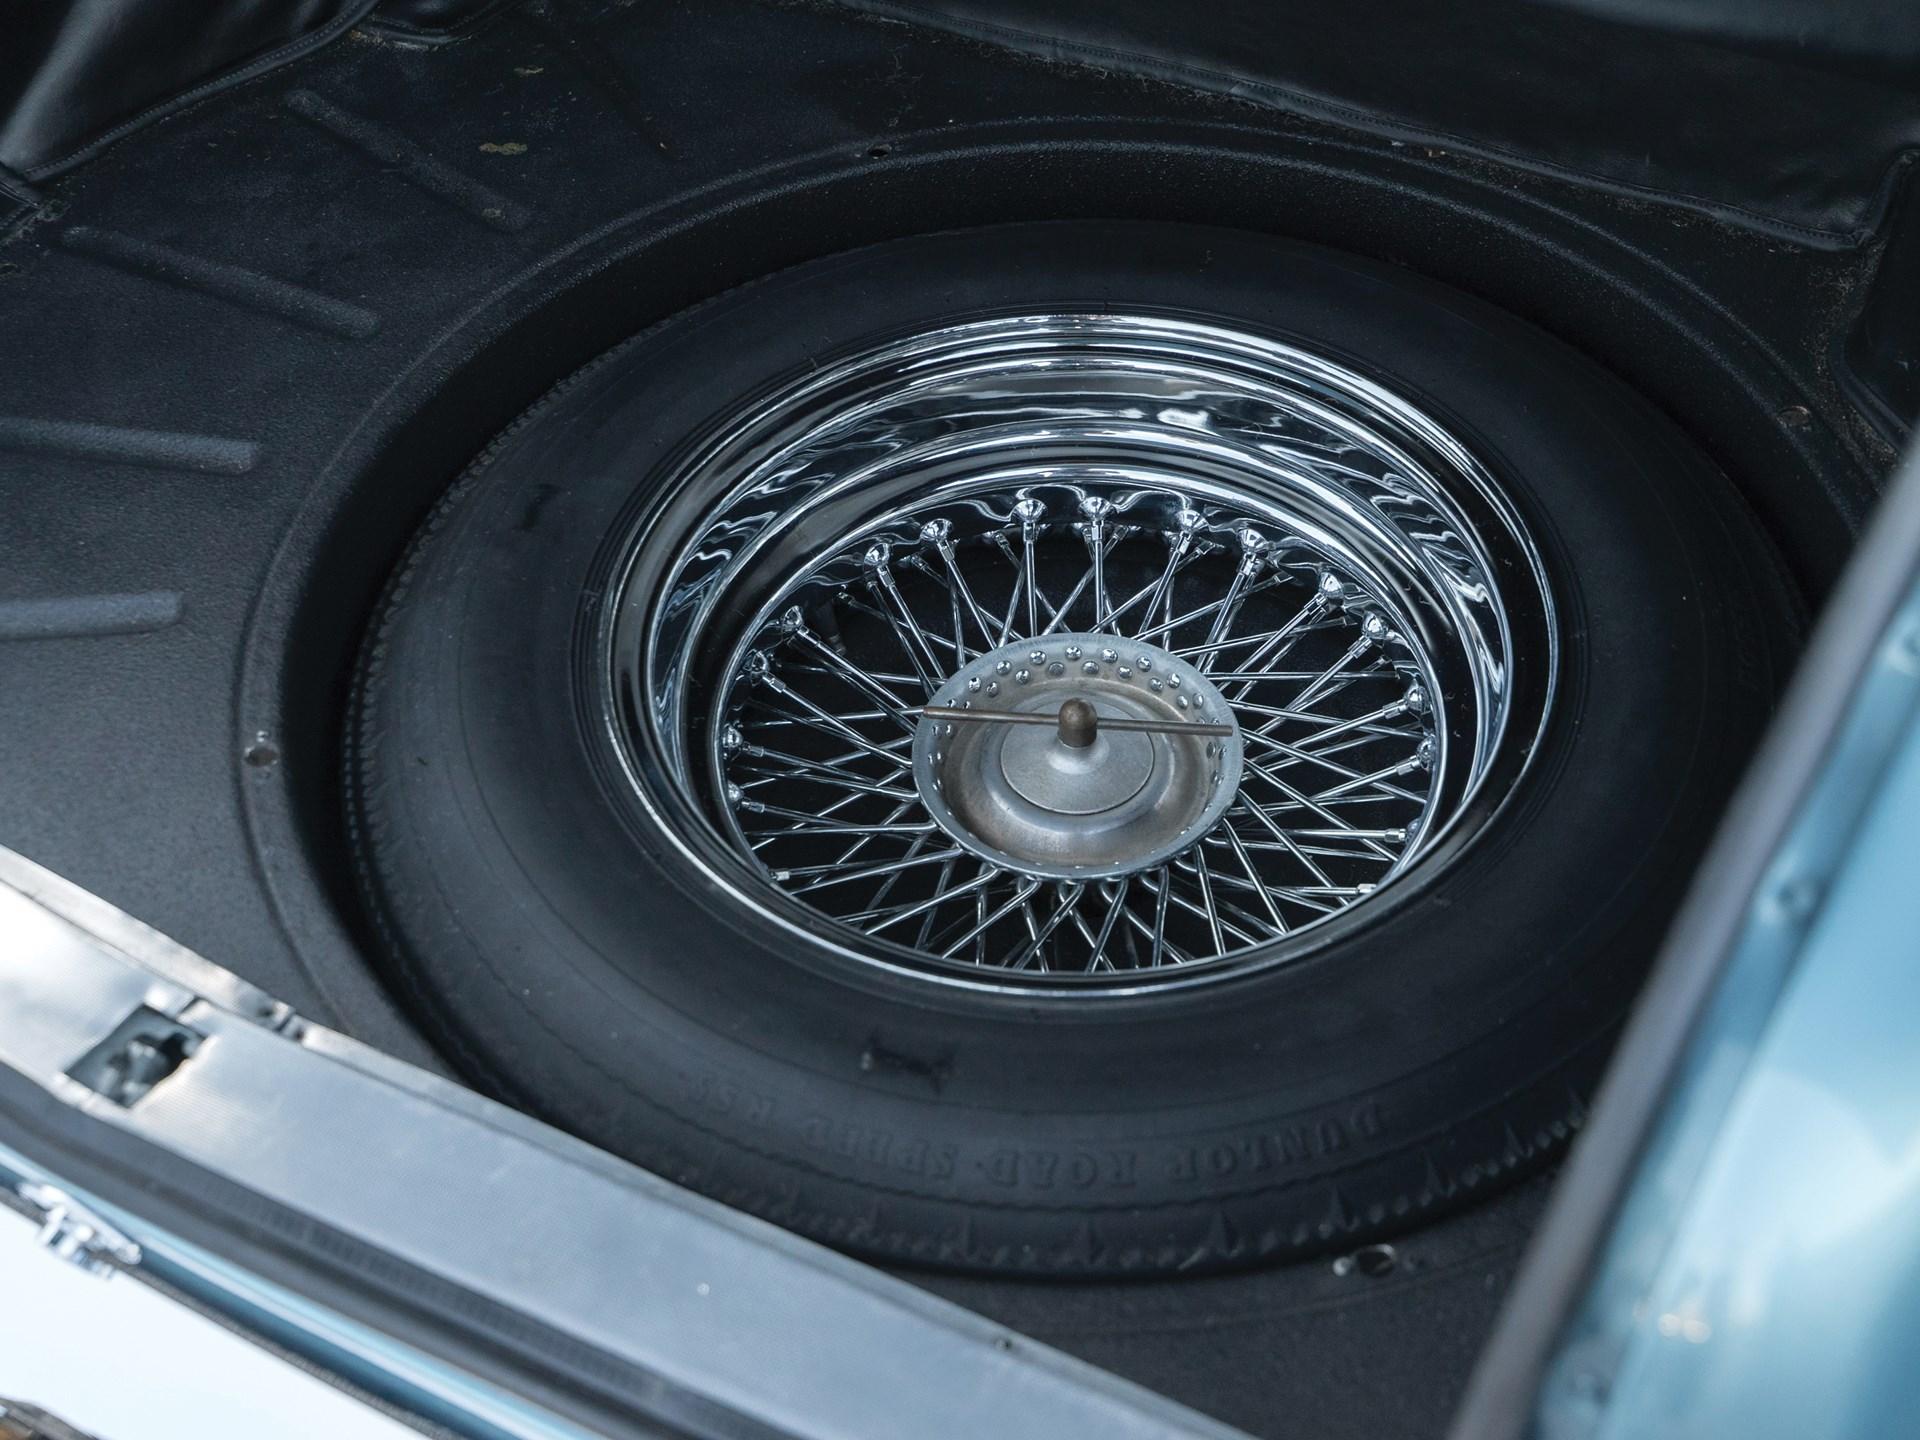 1962 Aston Martin DB4 Series IV